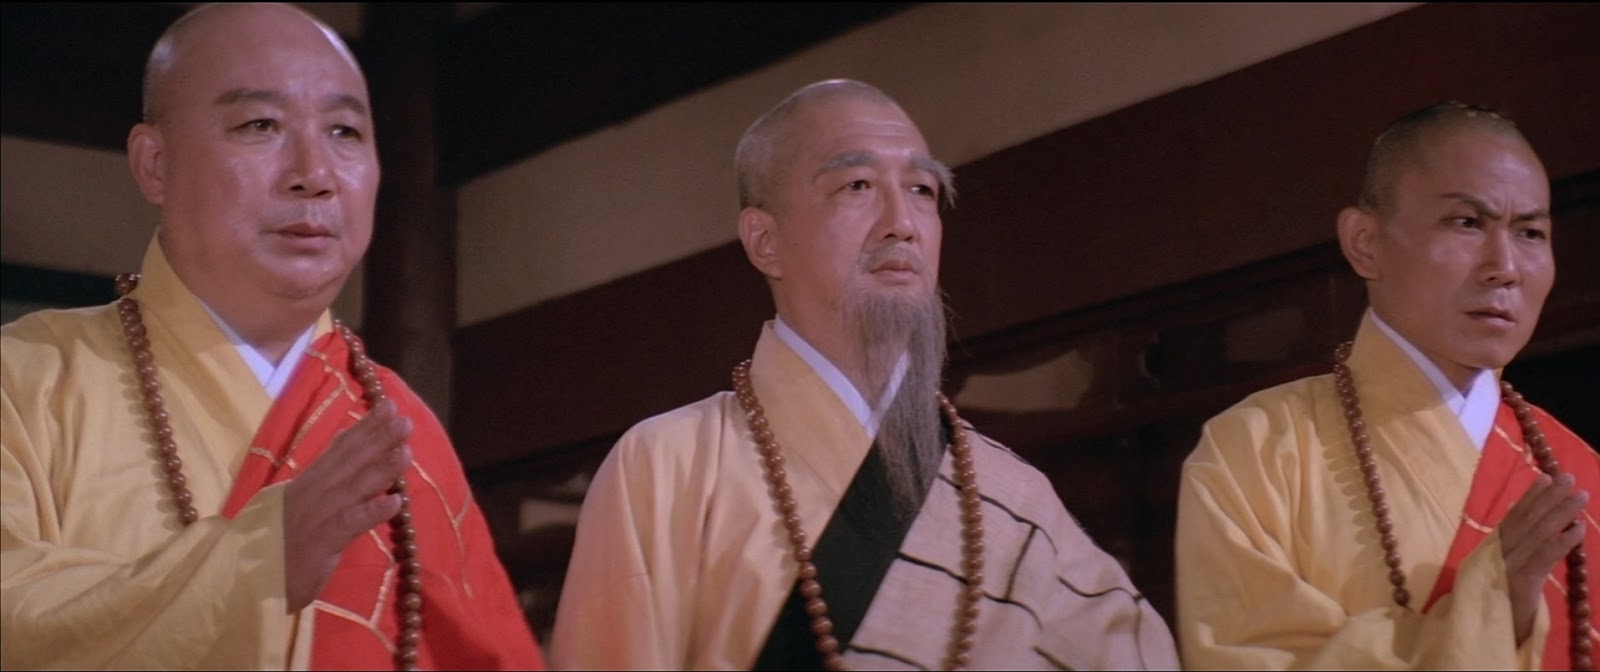 La Cámara 36 De Shaolin 1978 Dual BRRip 1080 Lig Zippy